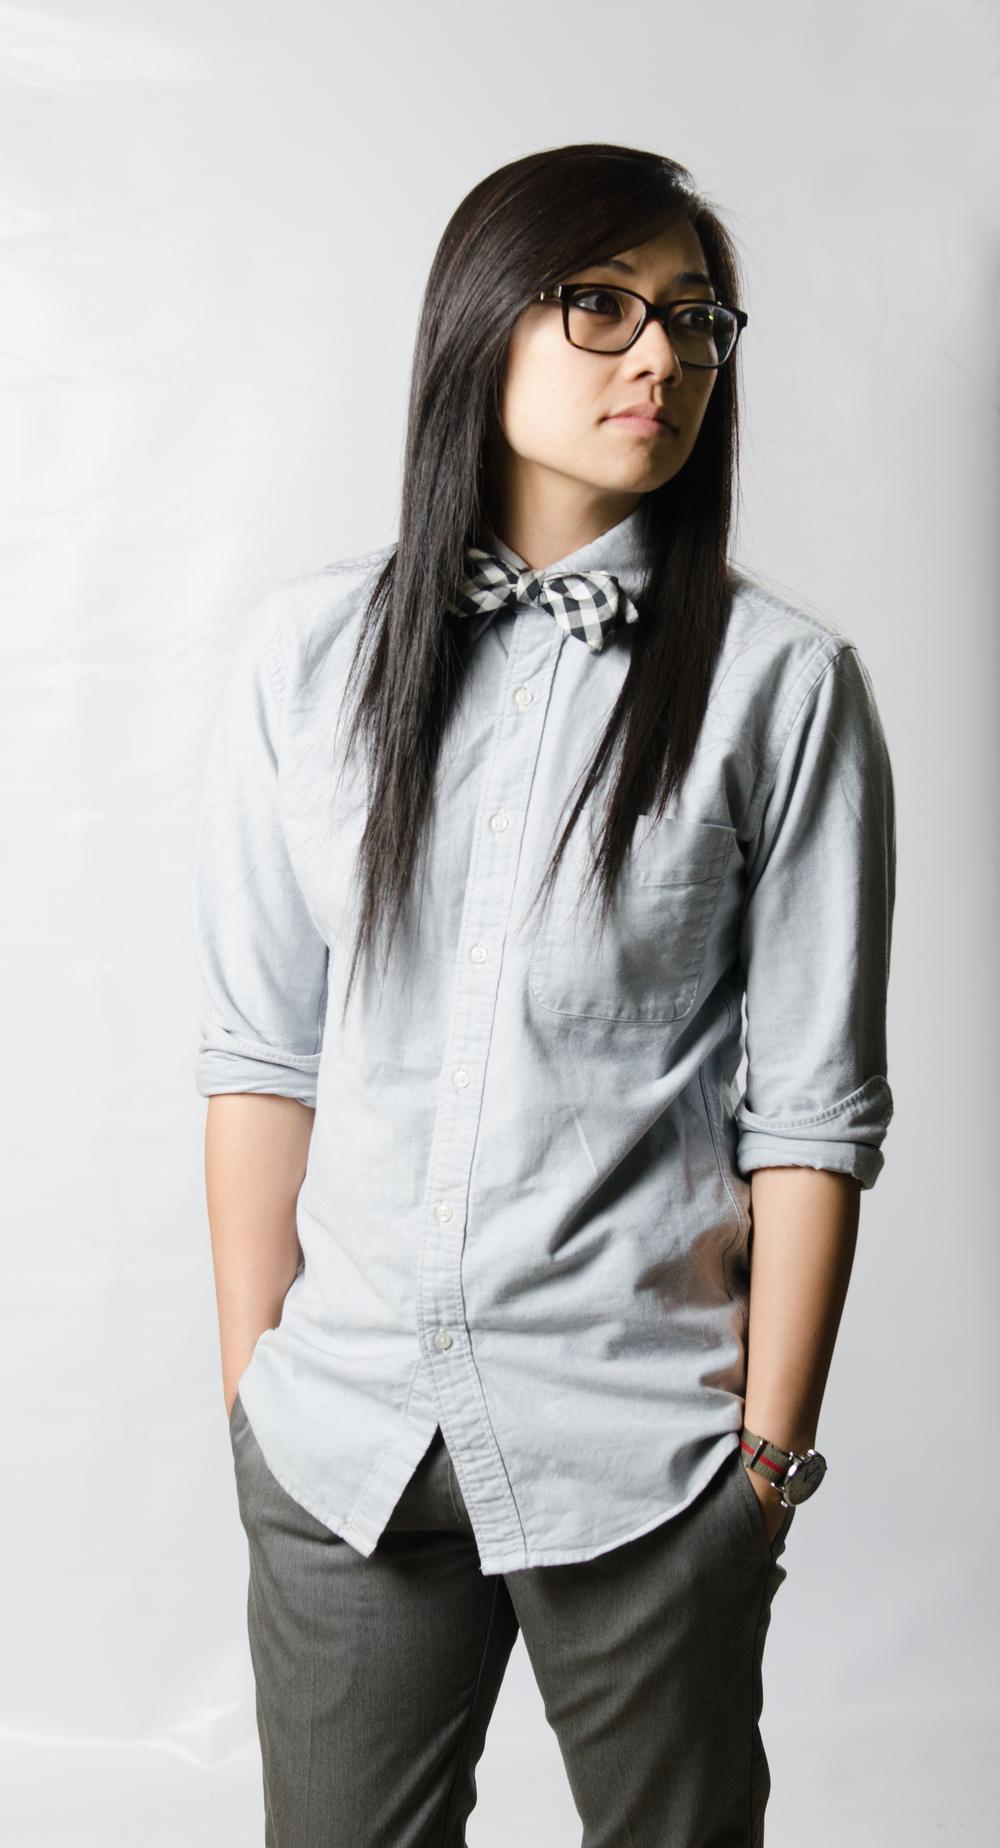 Style Profile: Teresa, Folsom, CA